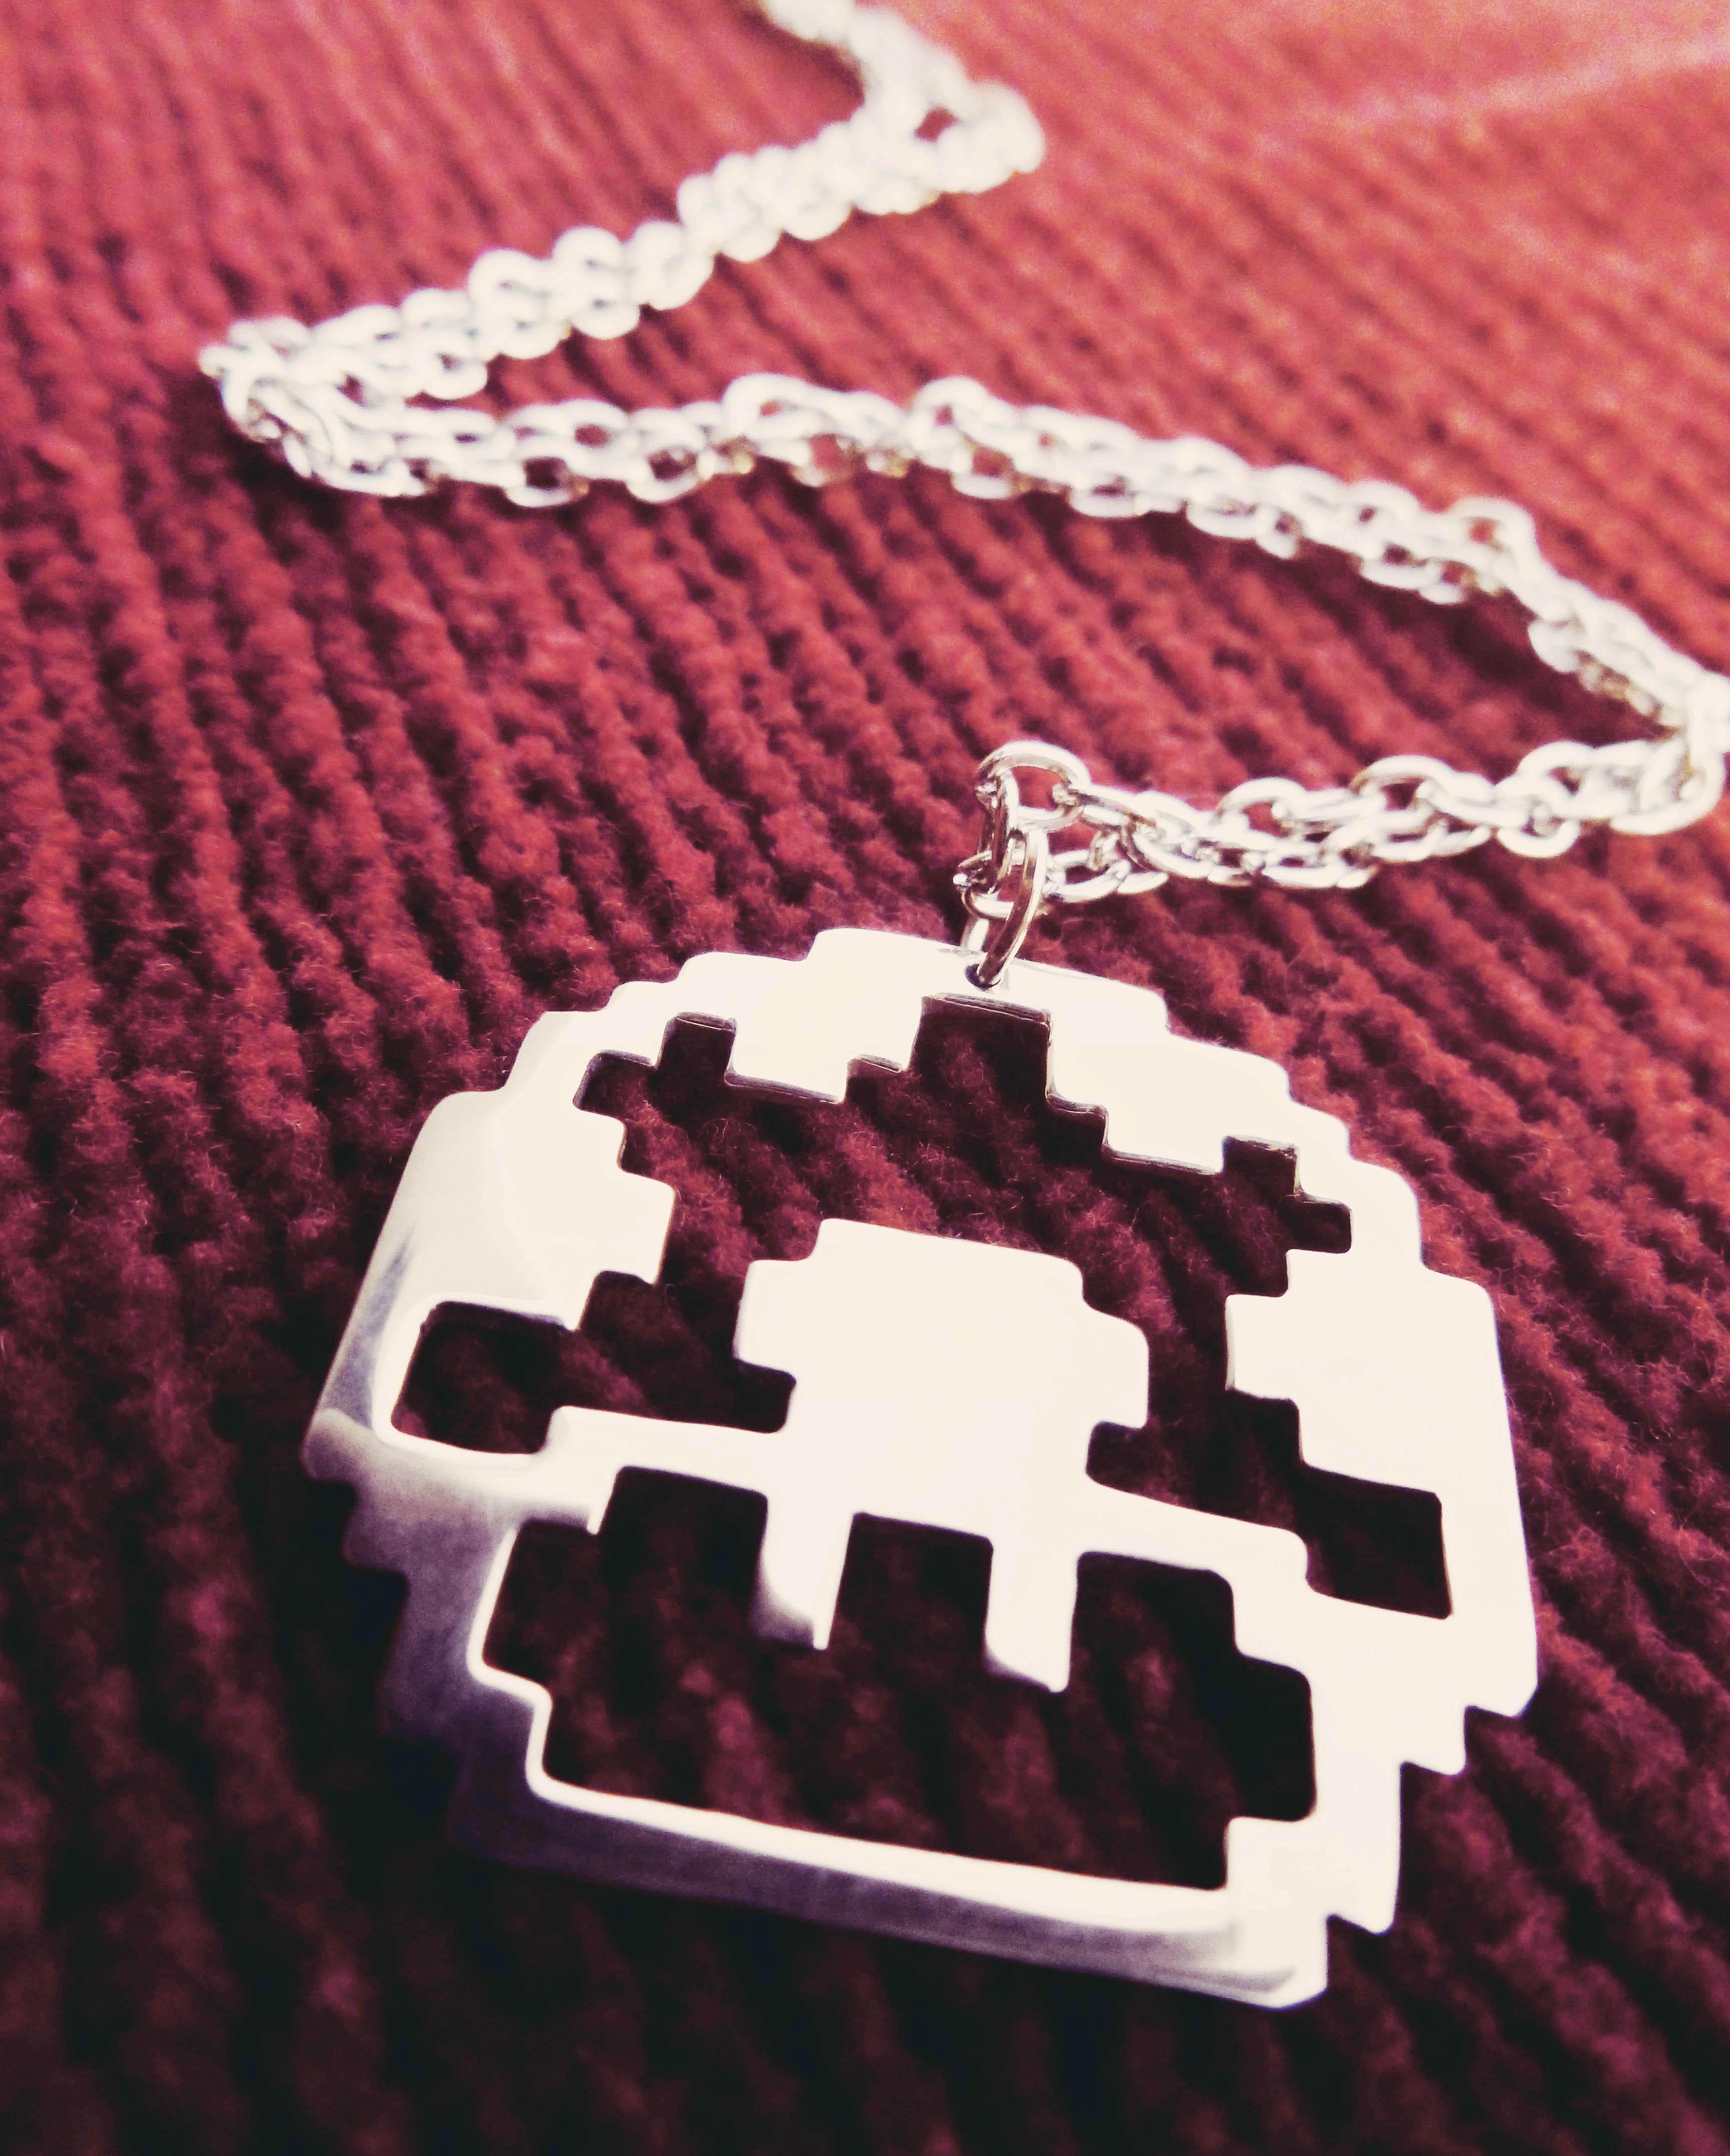 power_up_mushroom_pixel_pendant_necklace_necklaces_2.jpg